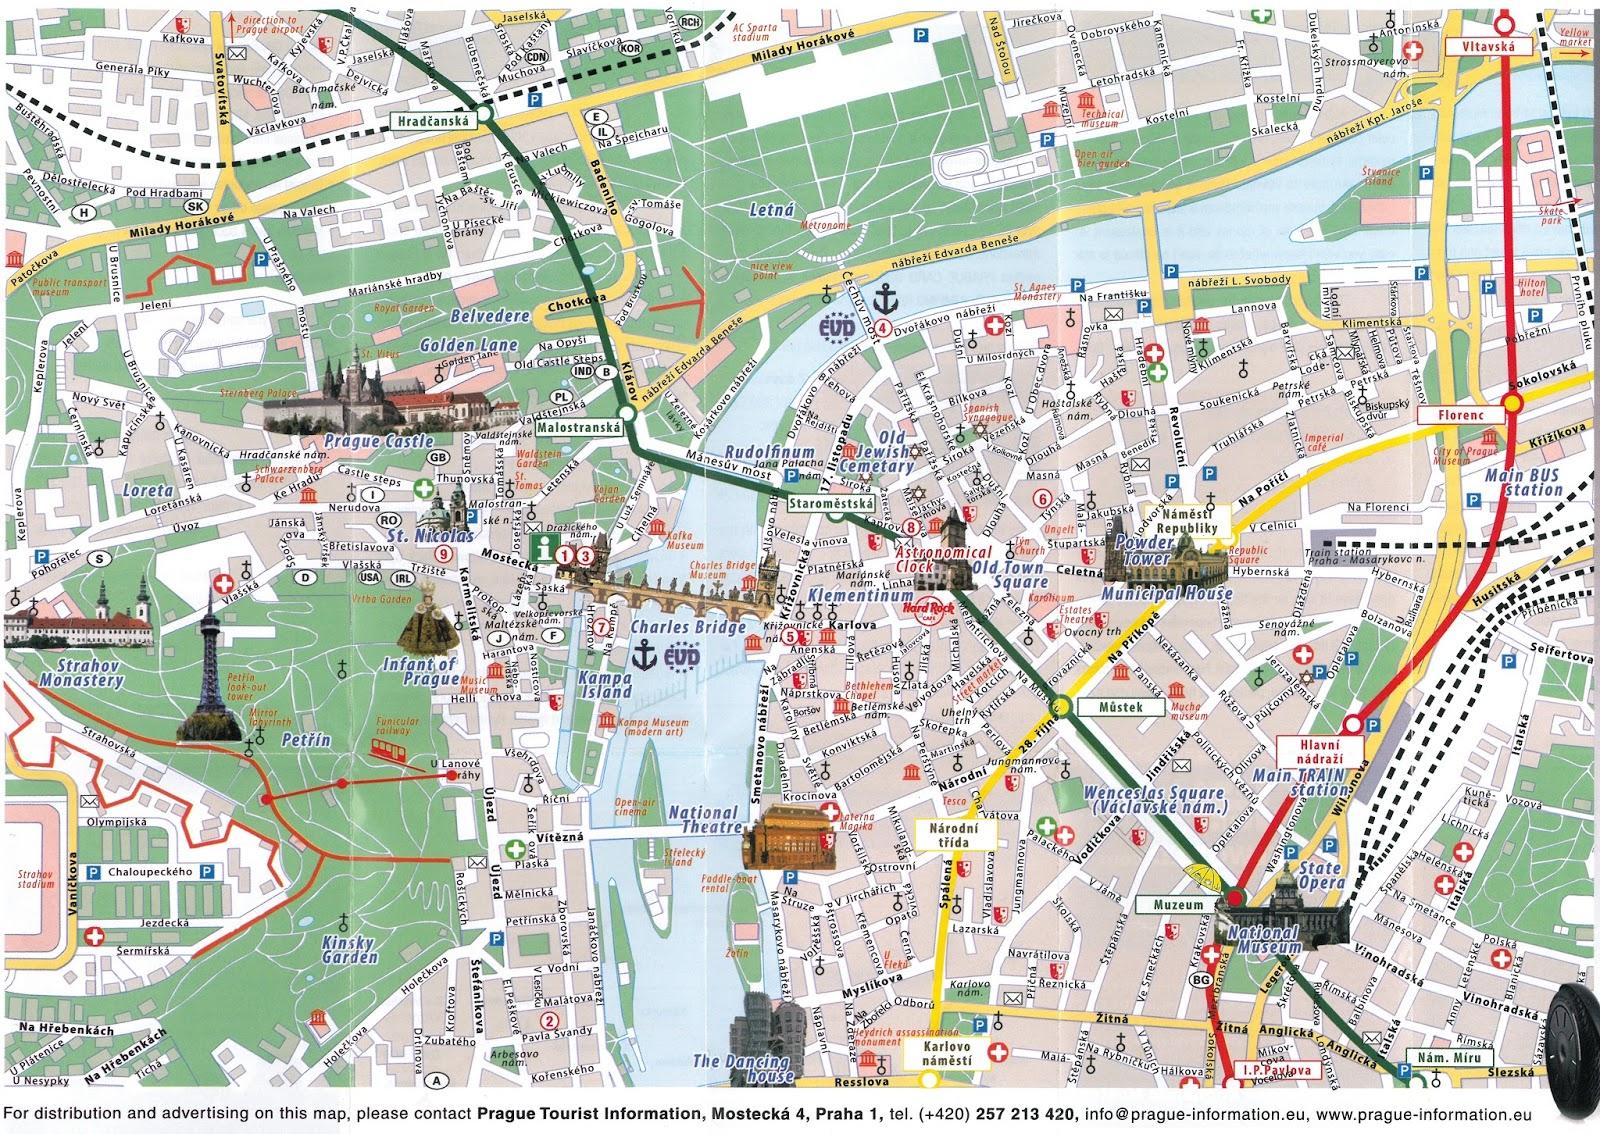 Prag Karte Sehenswurdigkeiten.Countryclub White Bisons Attergau Ausflug Prag Vom 12